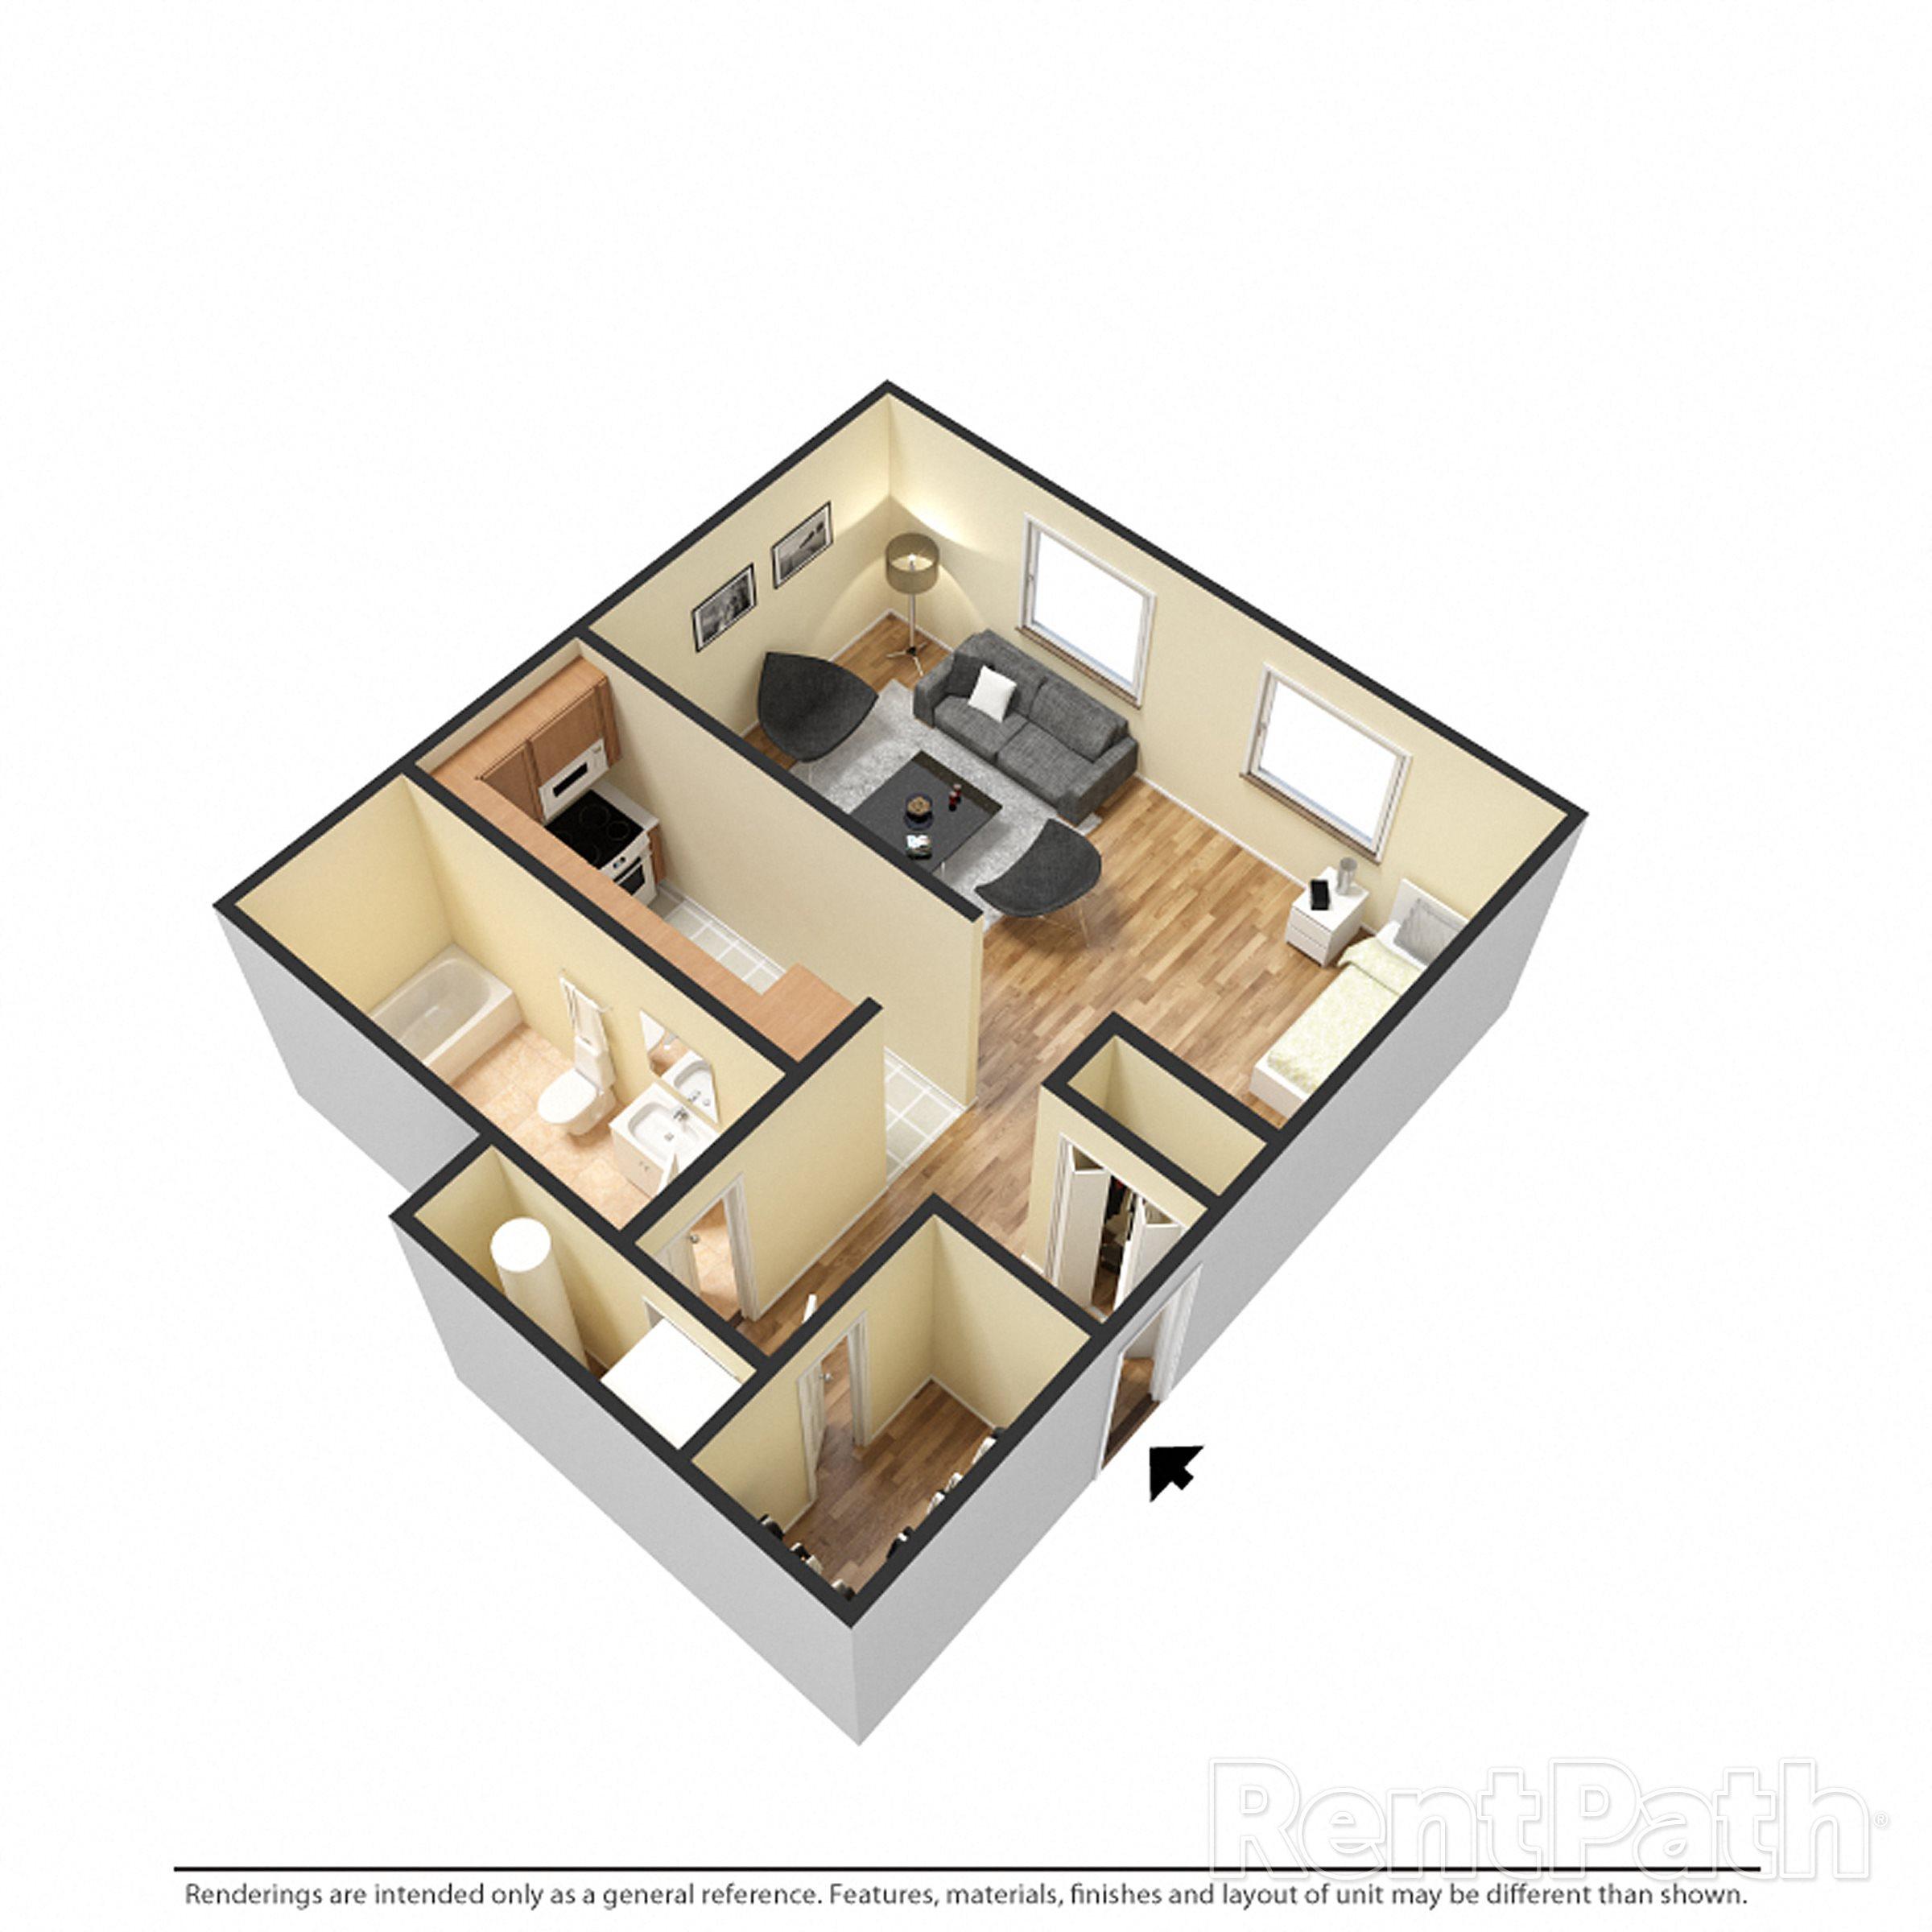 Hamilton Square Apartments eBrochure on